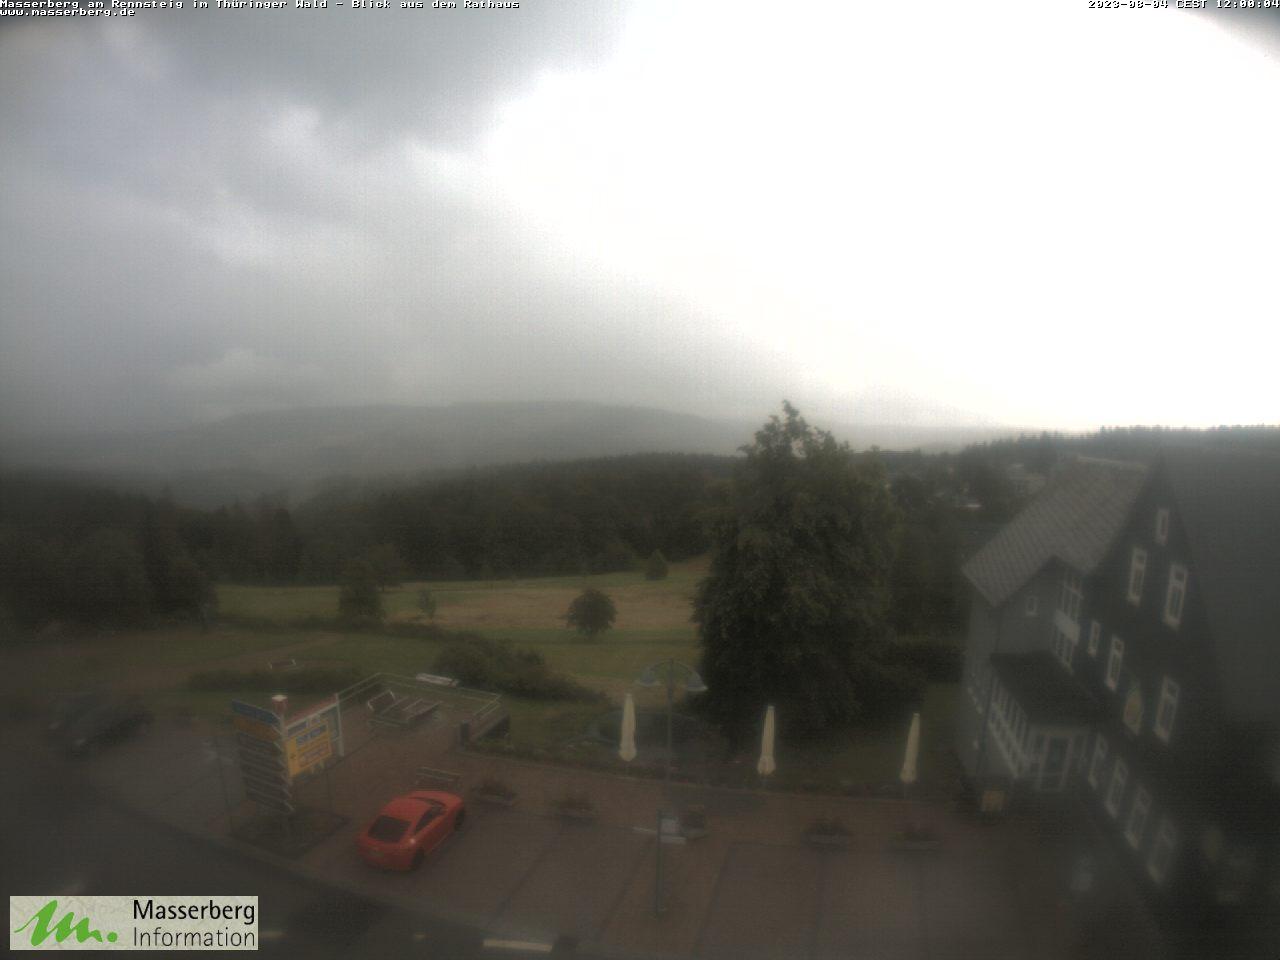 Webcam Skigebiet Masserberg - Skiarena Heubach Thüringer Wald